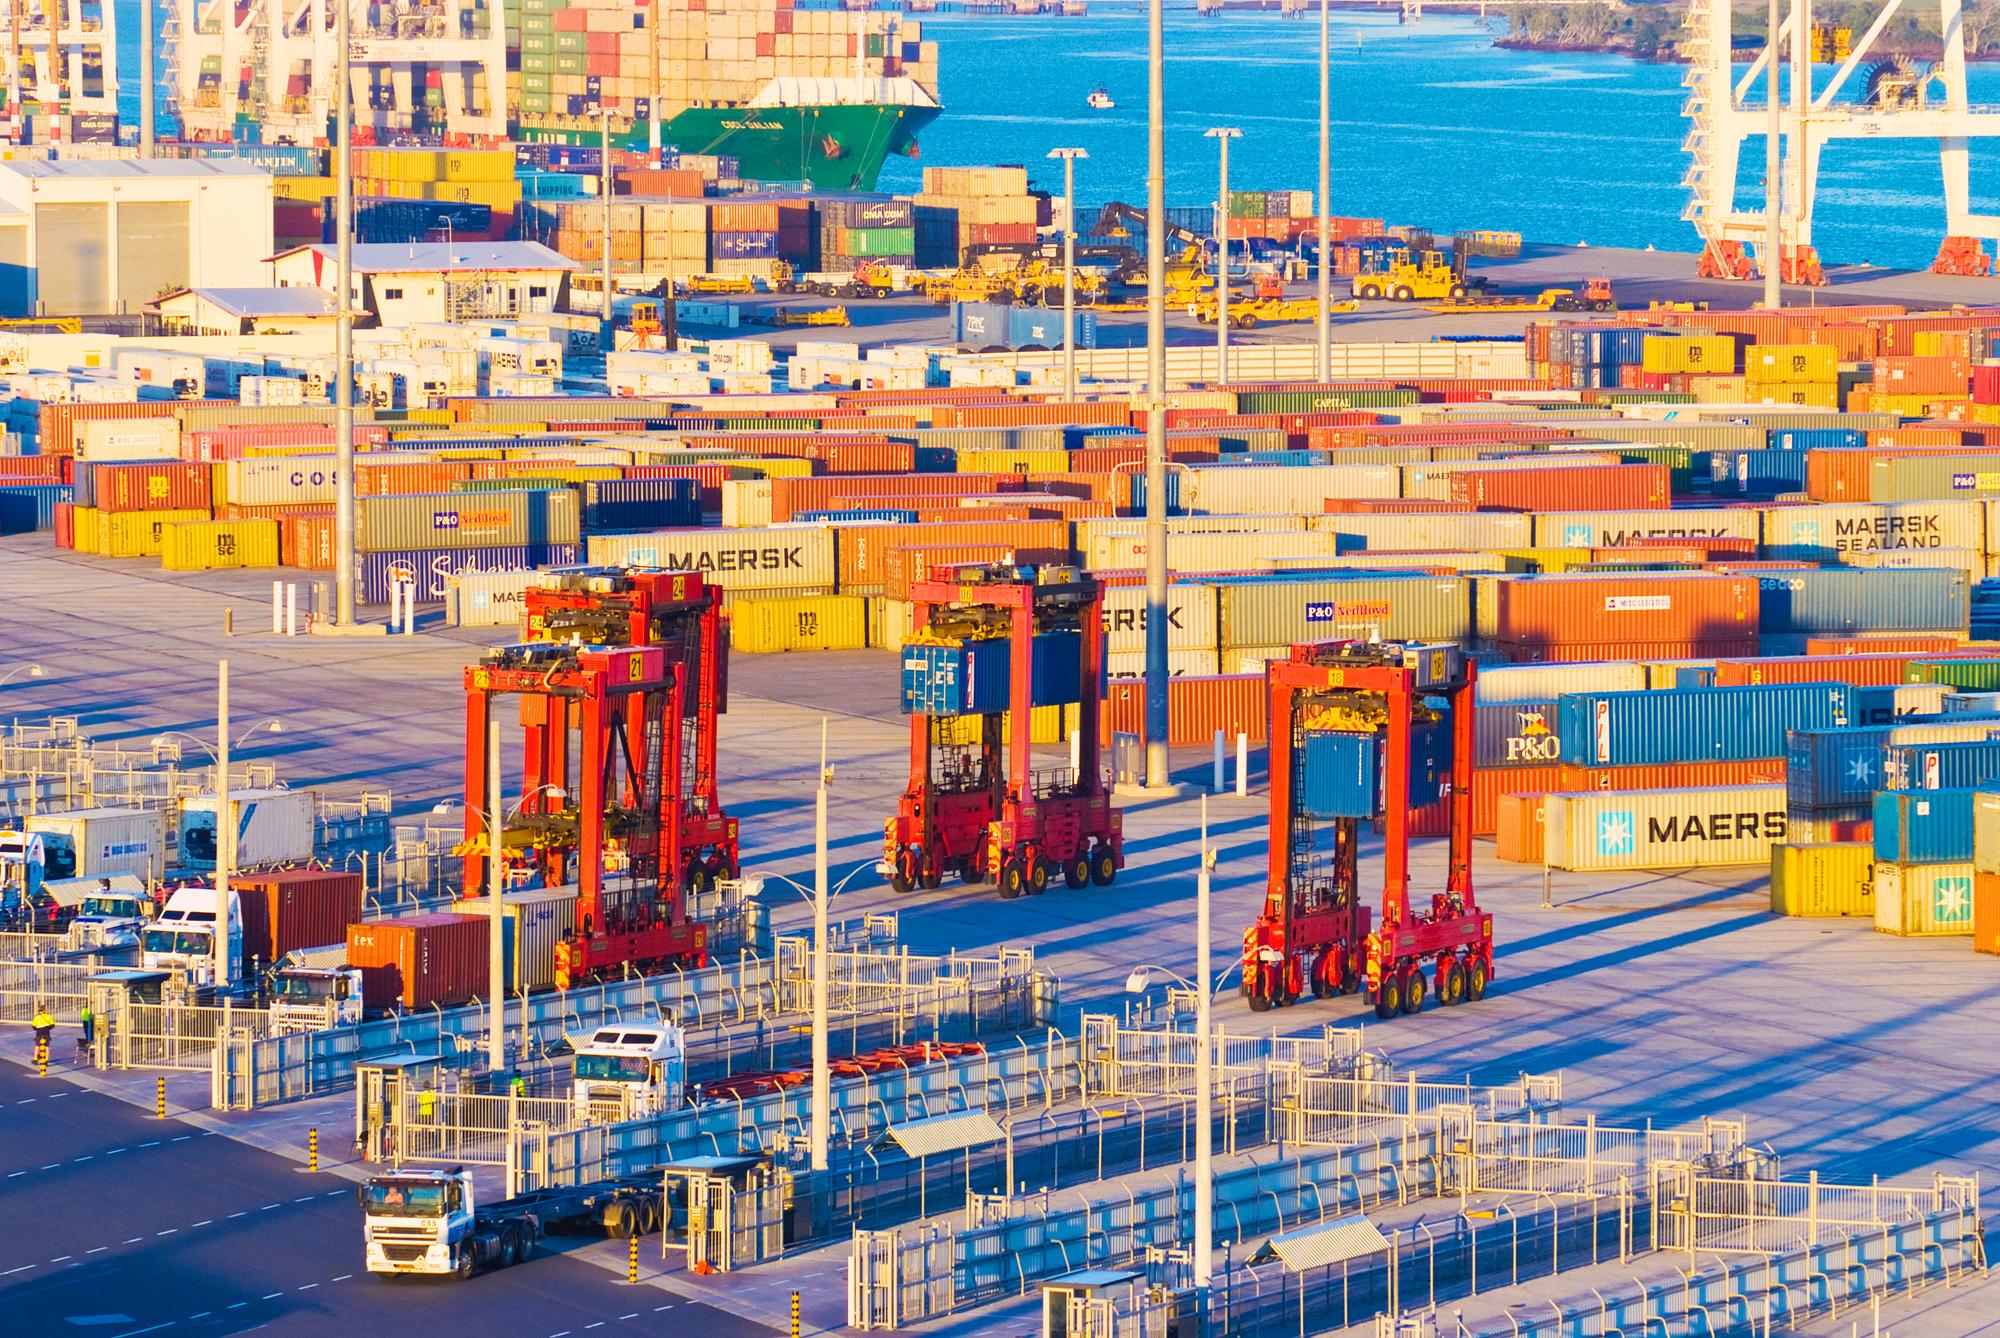 Kalmar to supply Patrick Terminals with AutoStrads